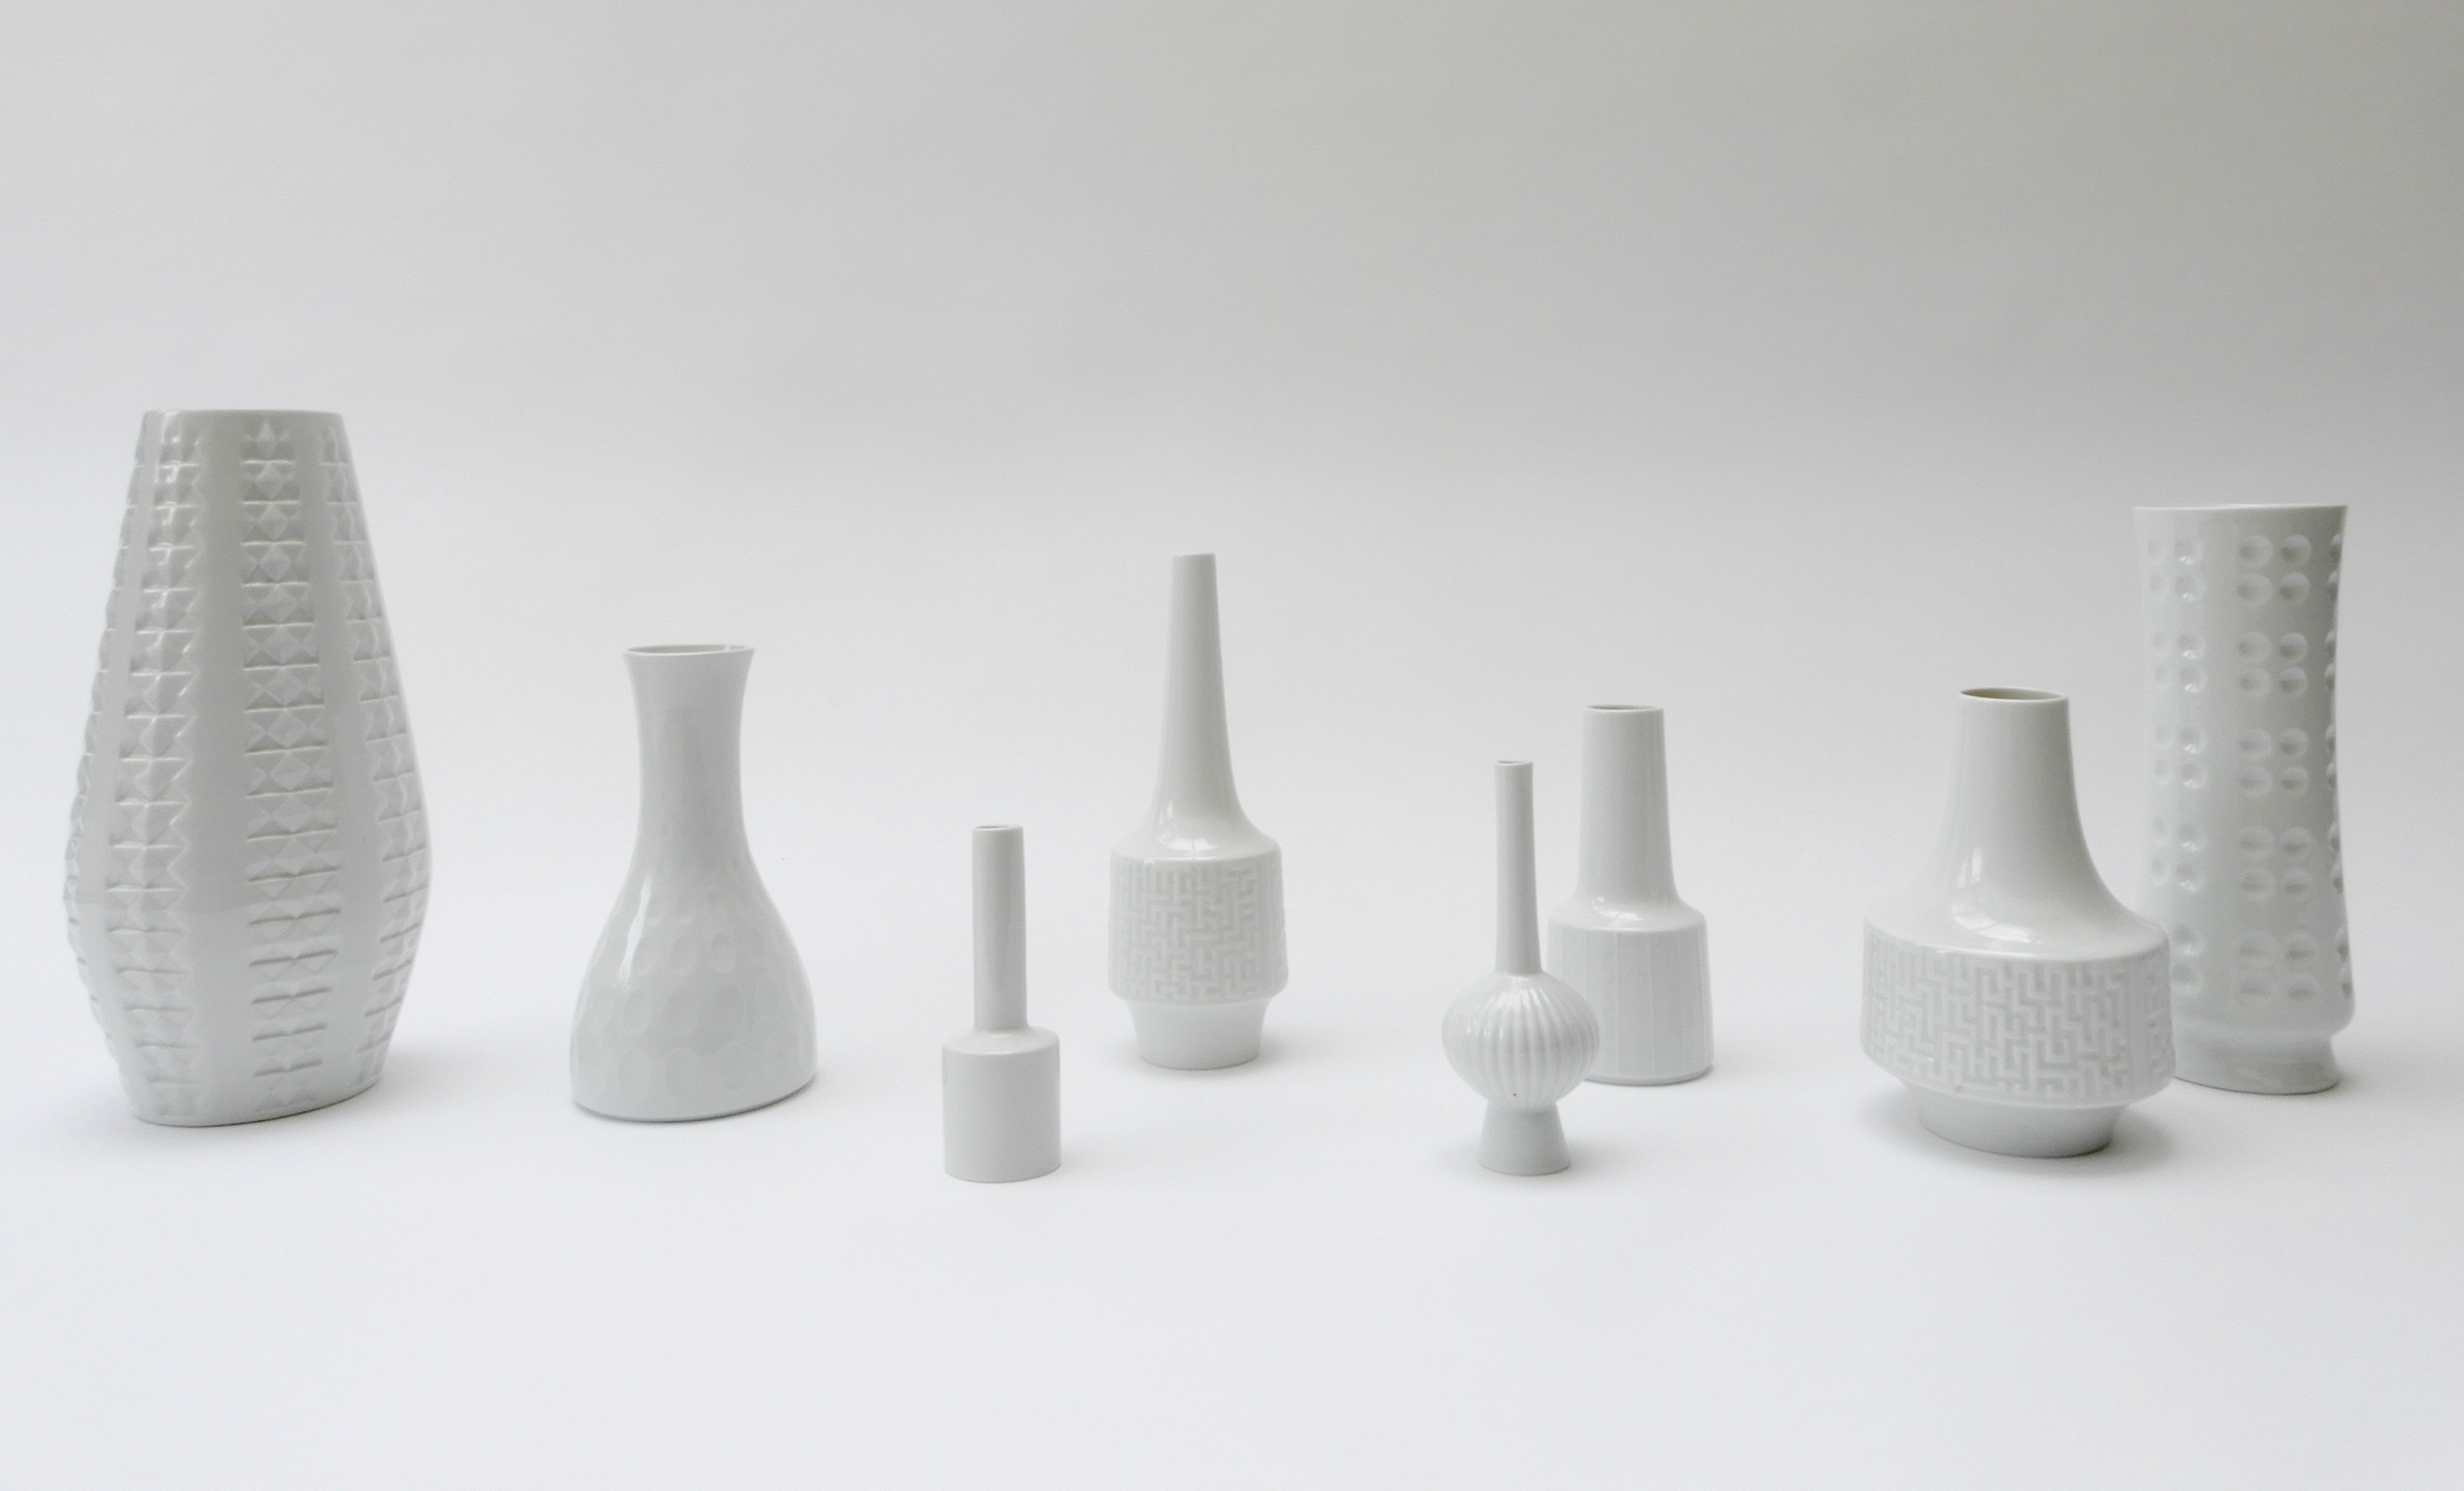 Sold - Set of 8 German White Ceramic Vases